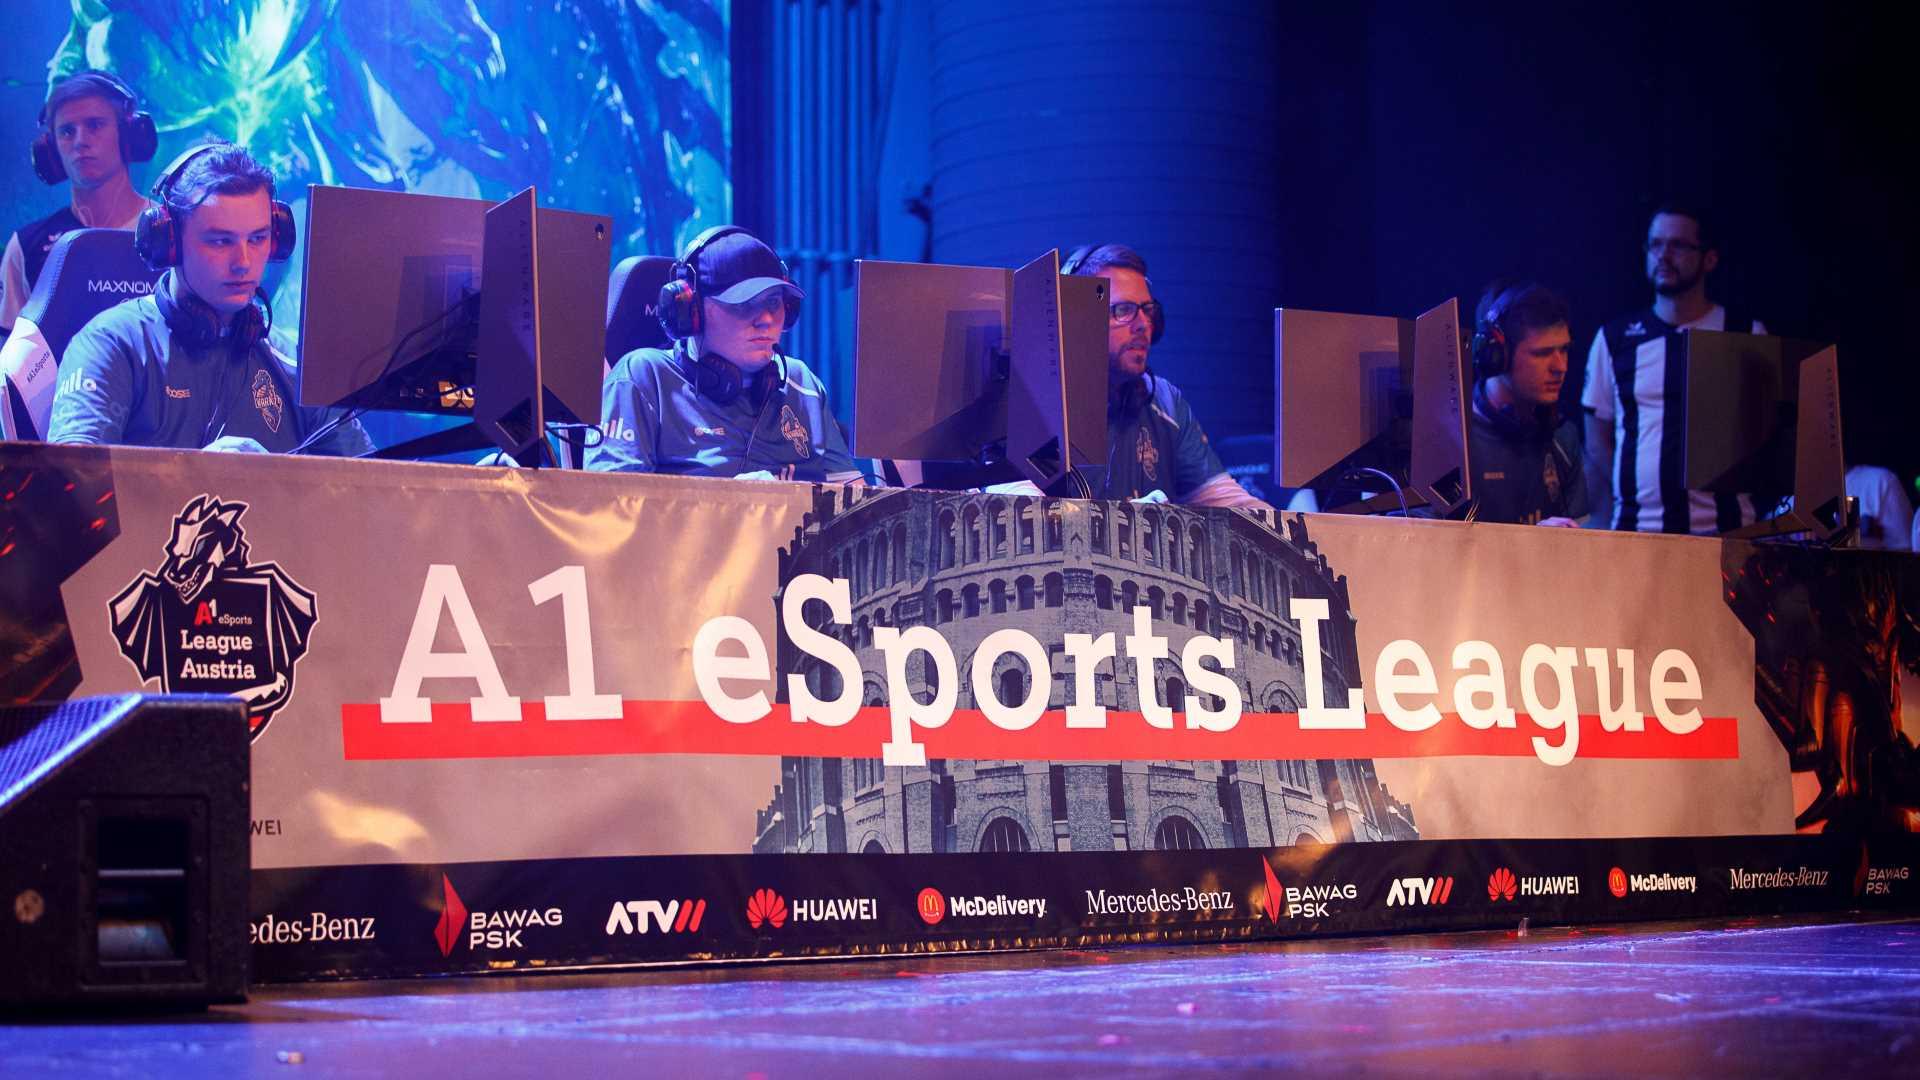 A1 eSports League Pro Series Panel